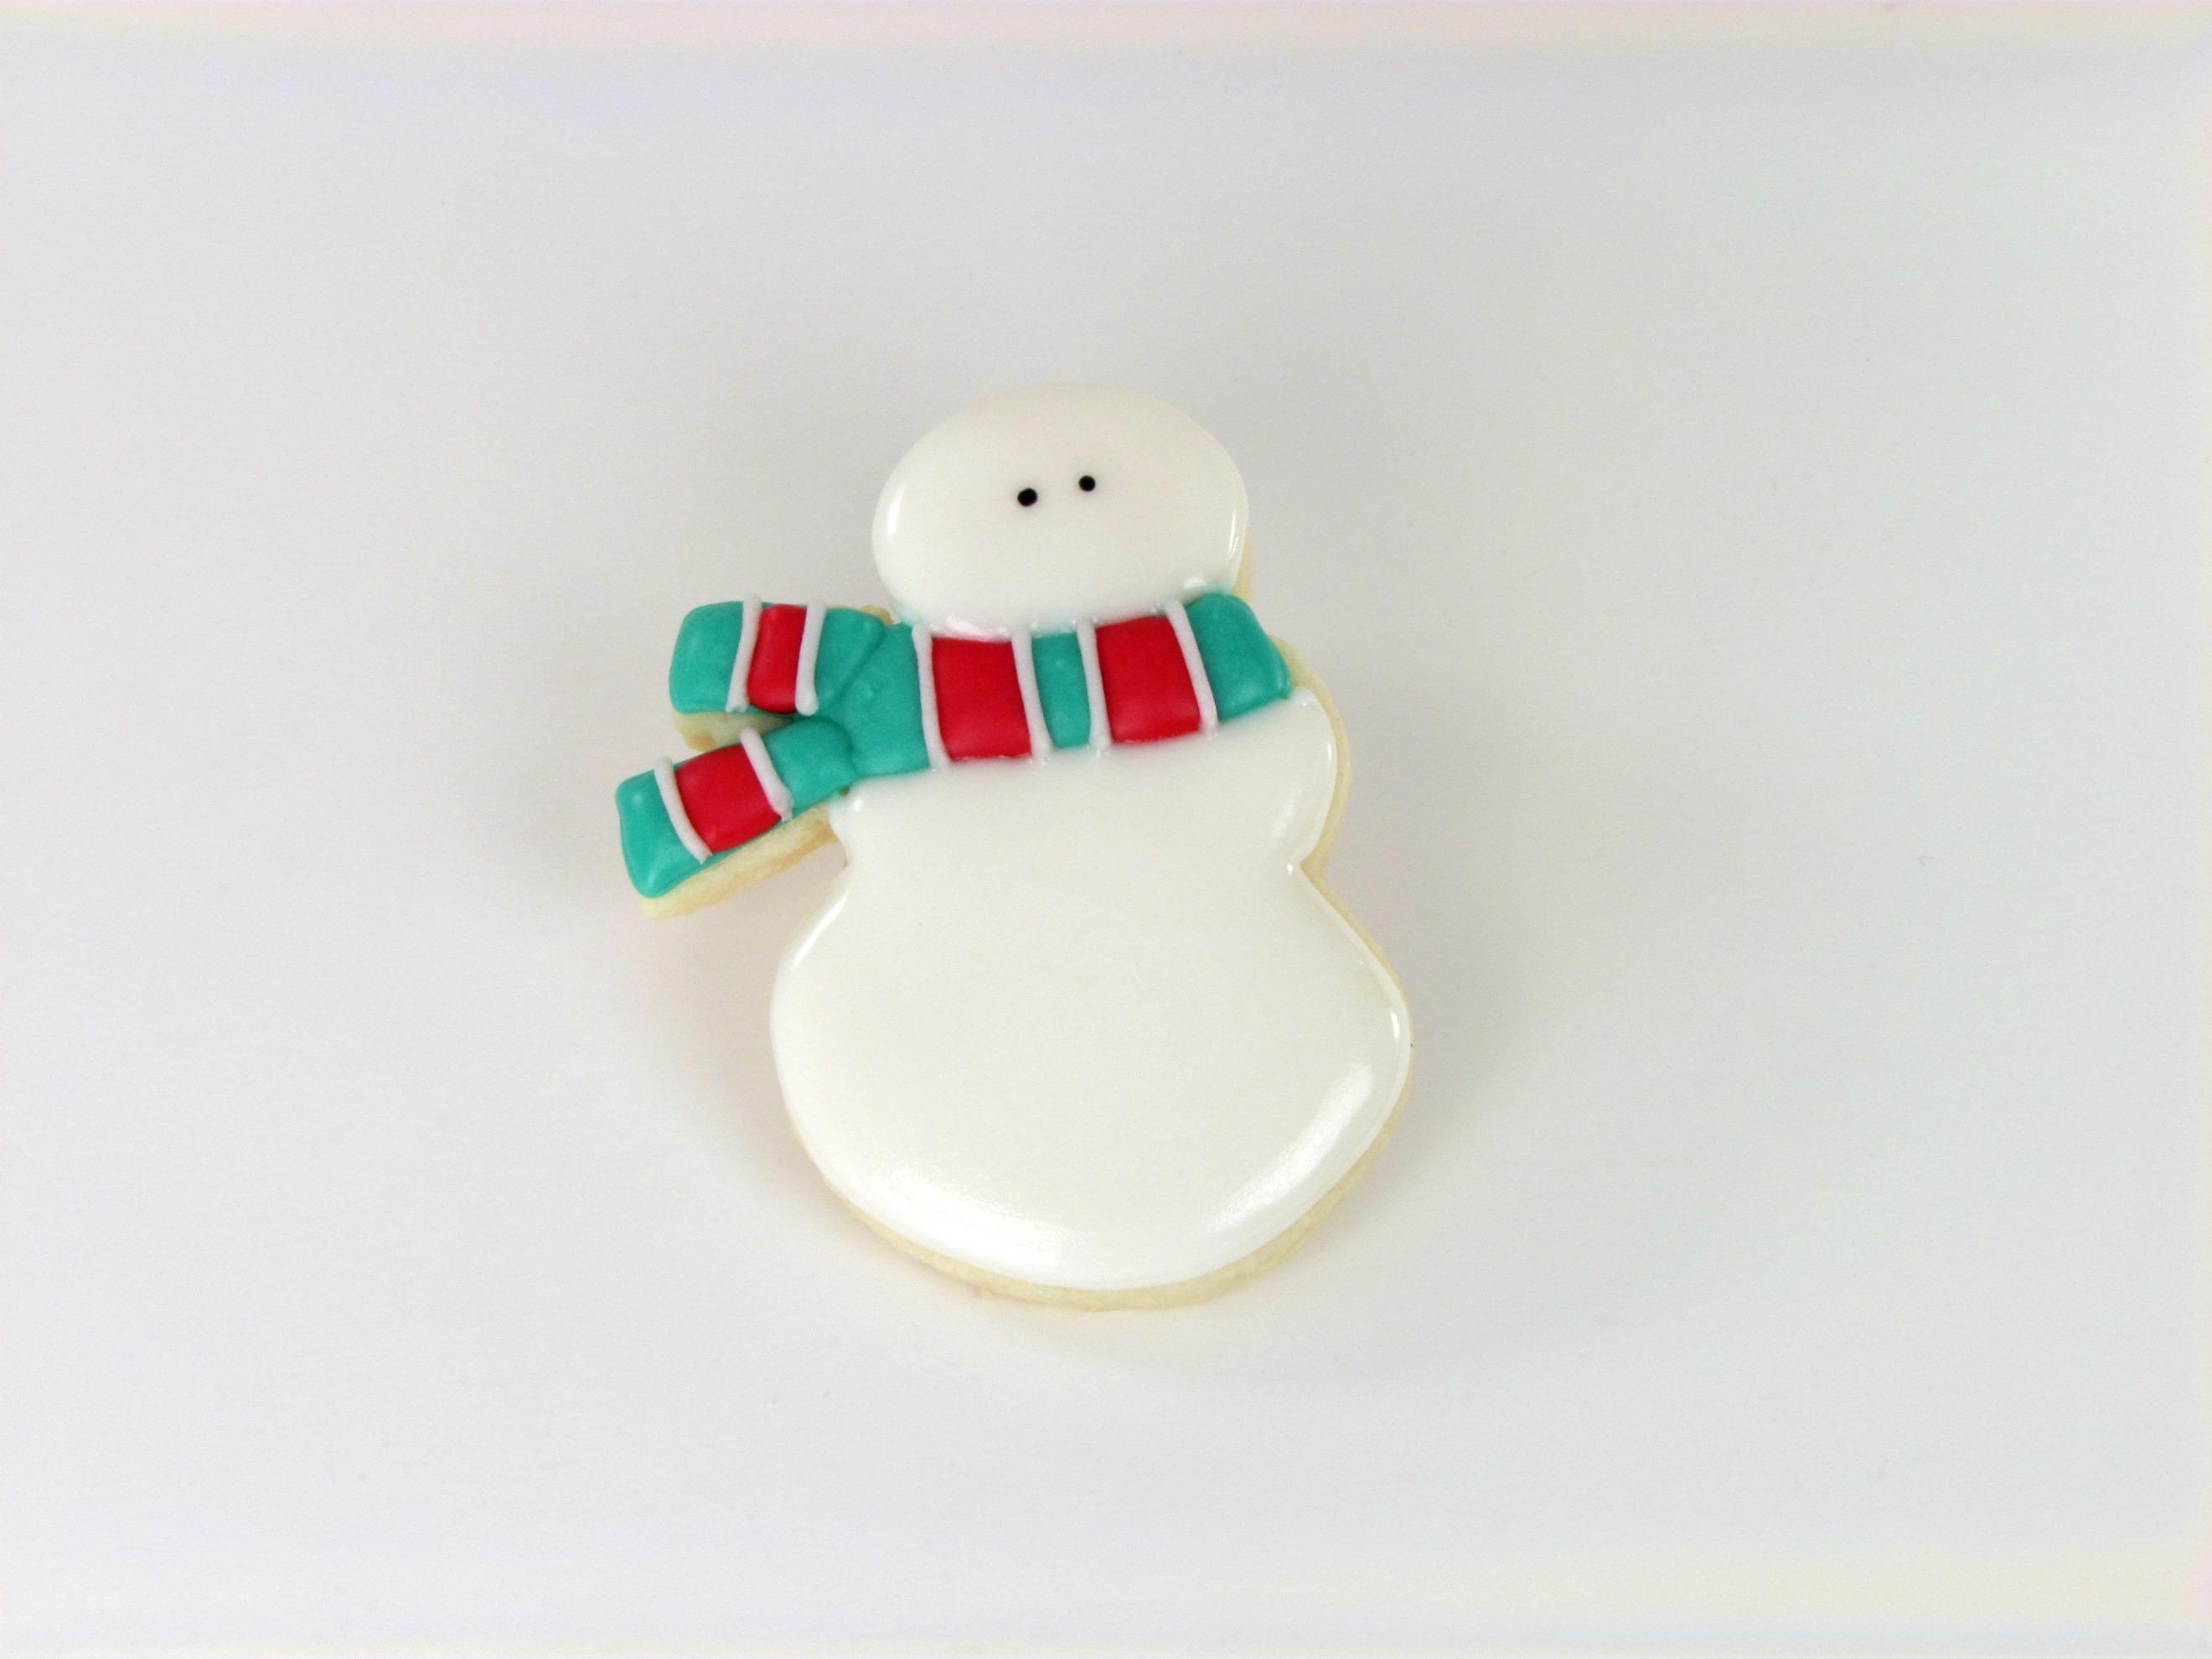 Little Old Snowman Cookies www.thebearfootbaker.com